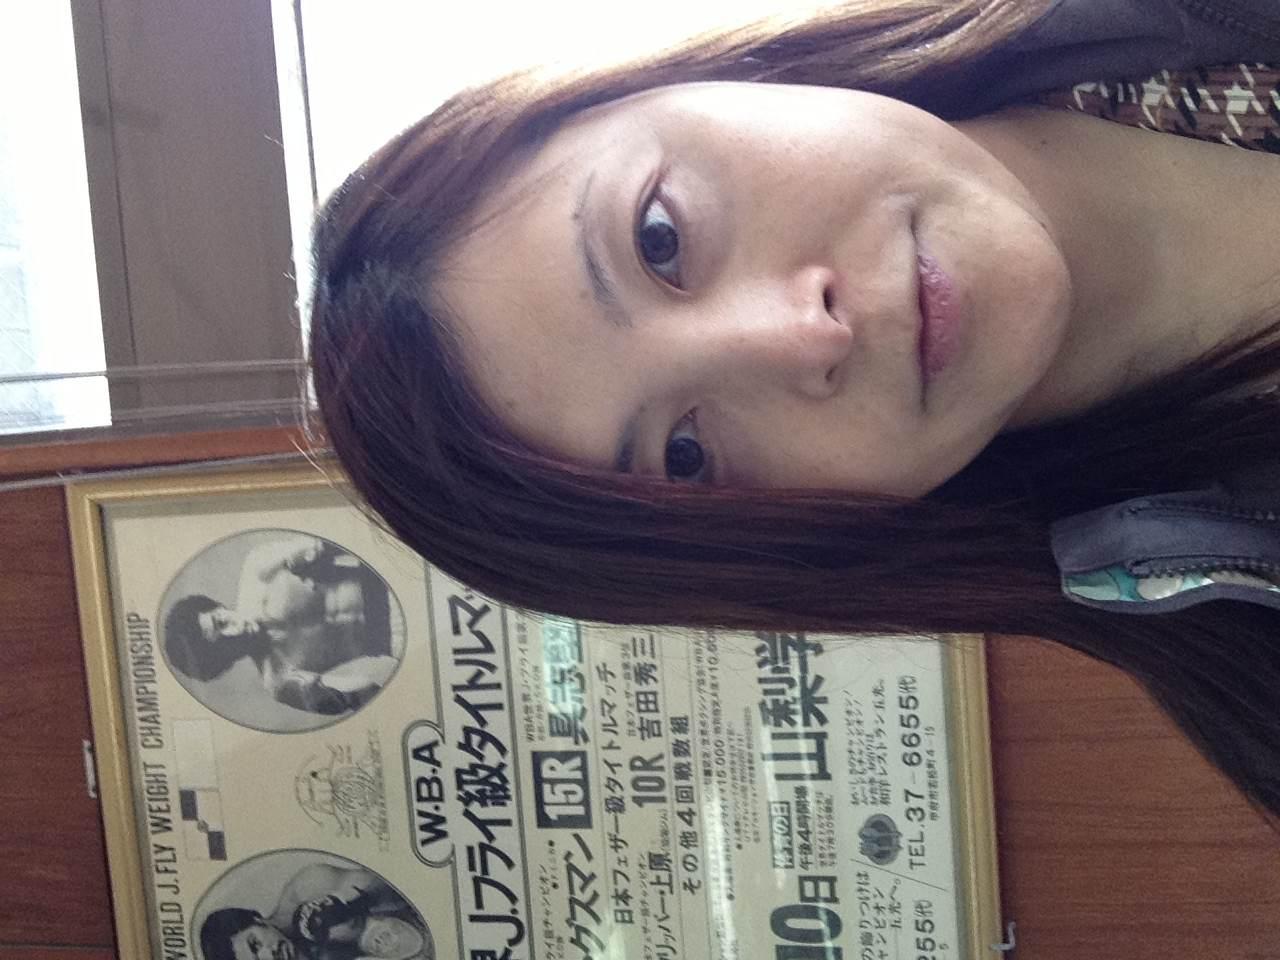 1/2013030417115305-photo-small.jpg